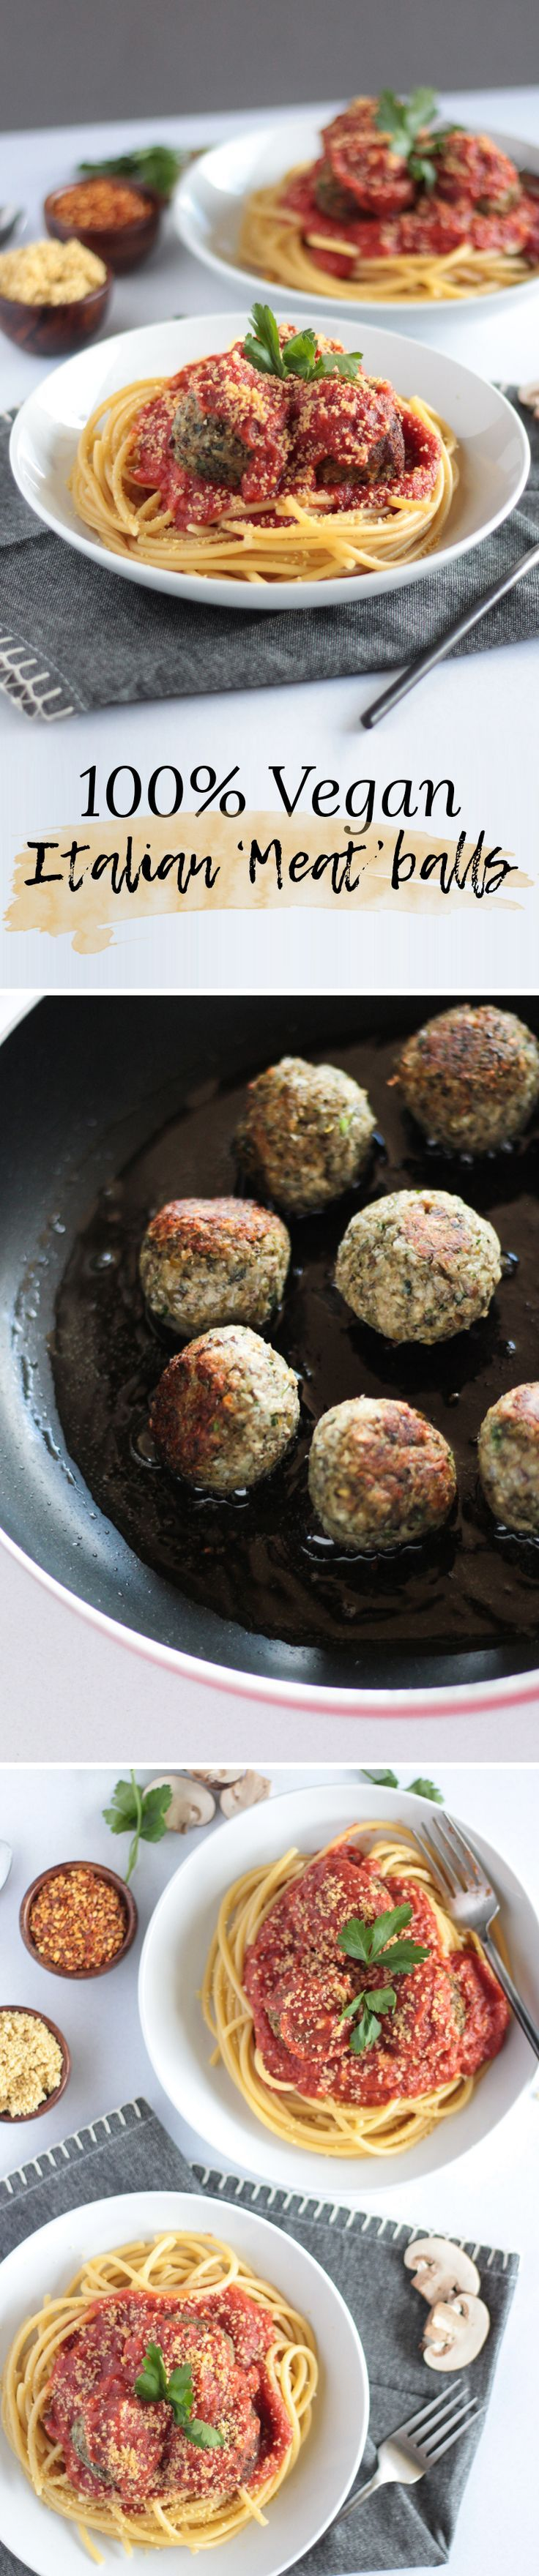 Vegan Italian Meatballs made with lentils and mushrooms